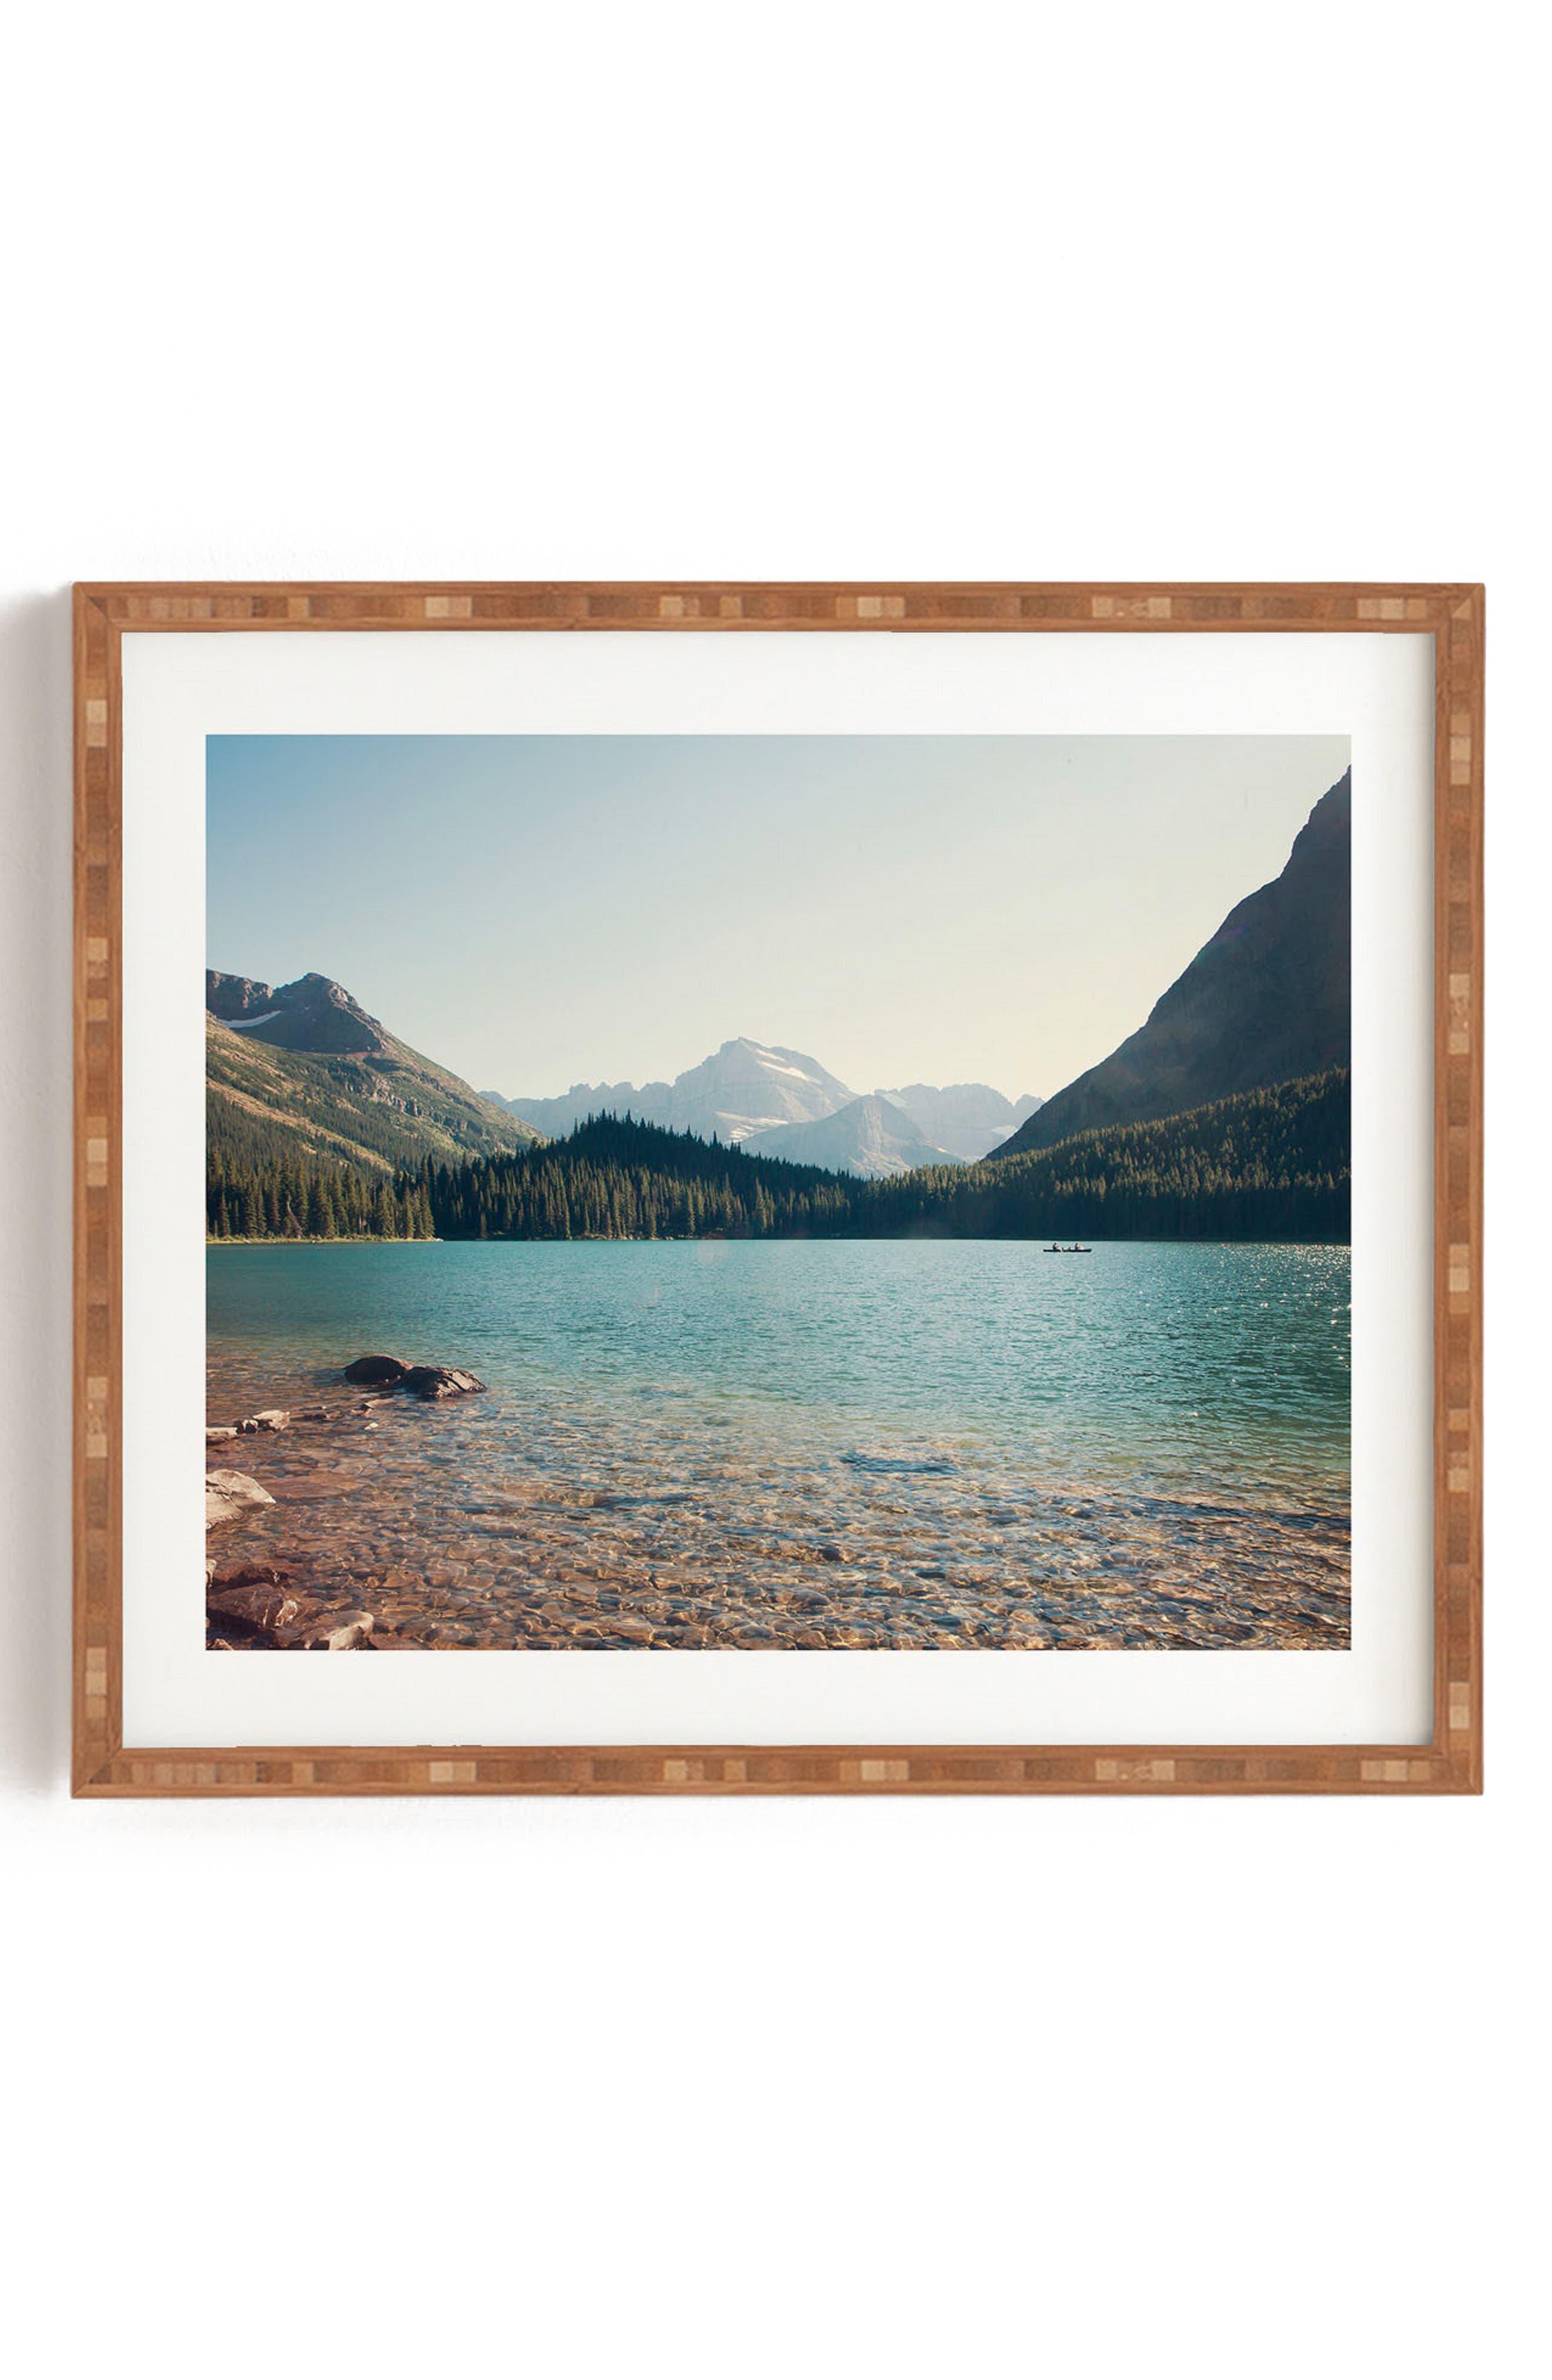 DENY DESIGNS Catherine McDonald - Glacier Summer Framed Wall Art, Main, color, GREEN